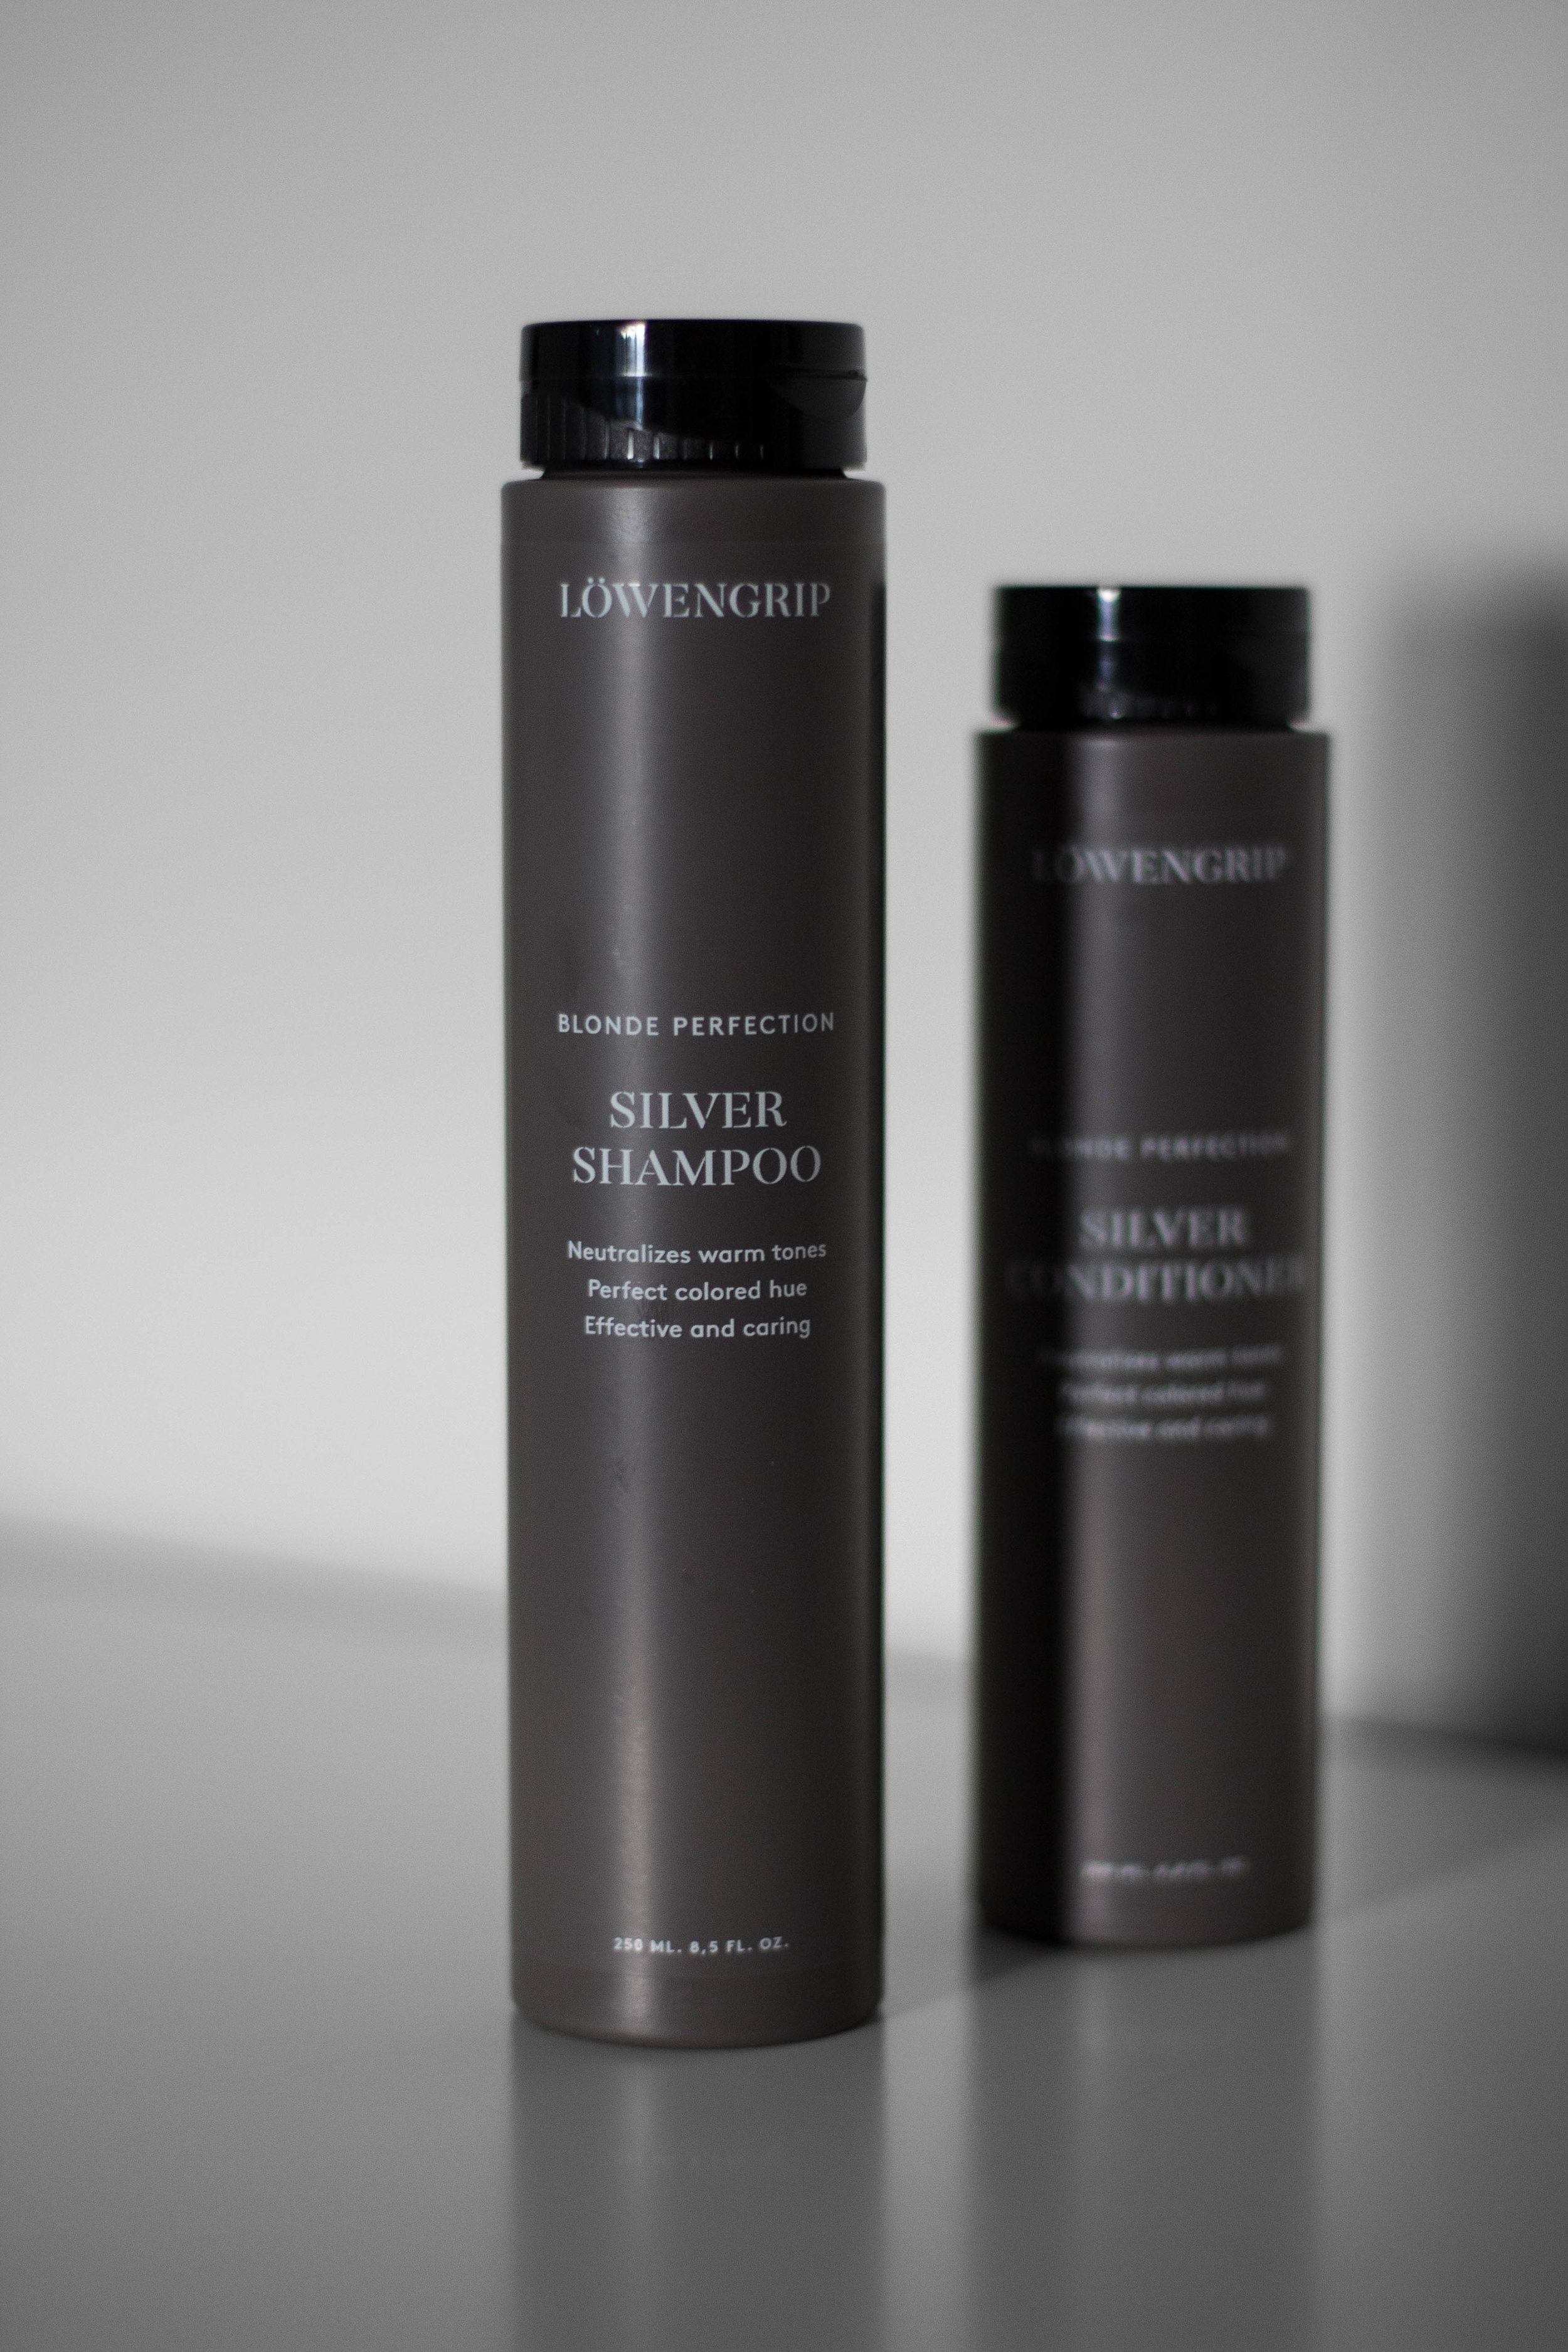 löwengrip, healthyhair, shampoo,aboutthatlook, beauty, care, blonde hair, silvershampoo